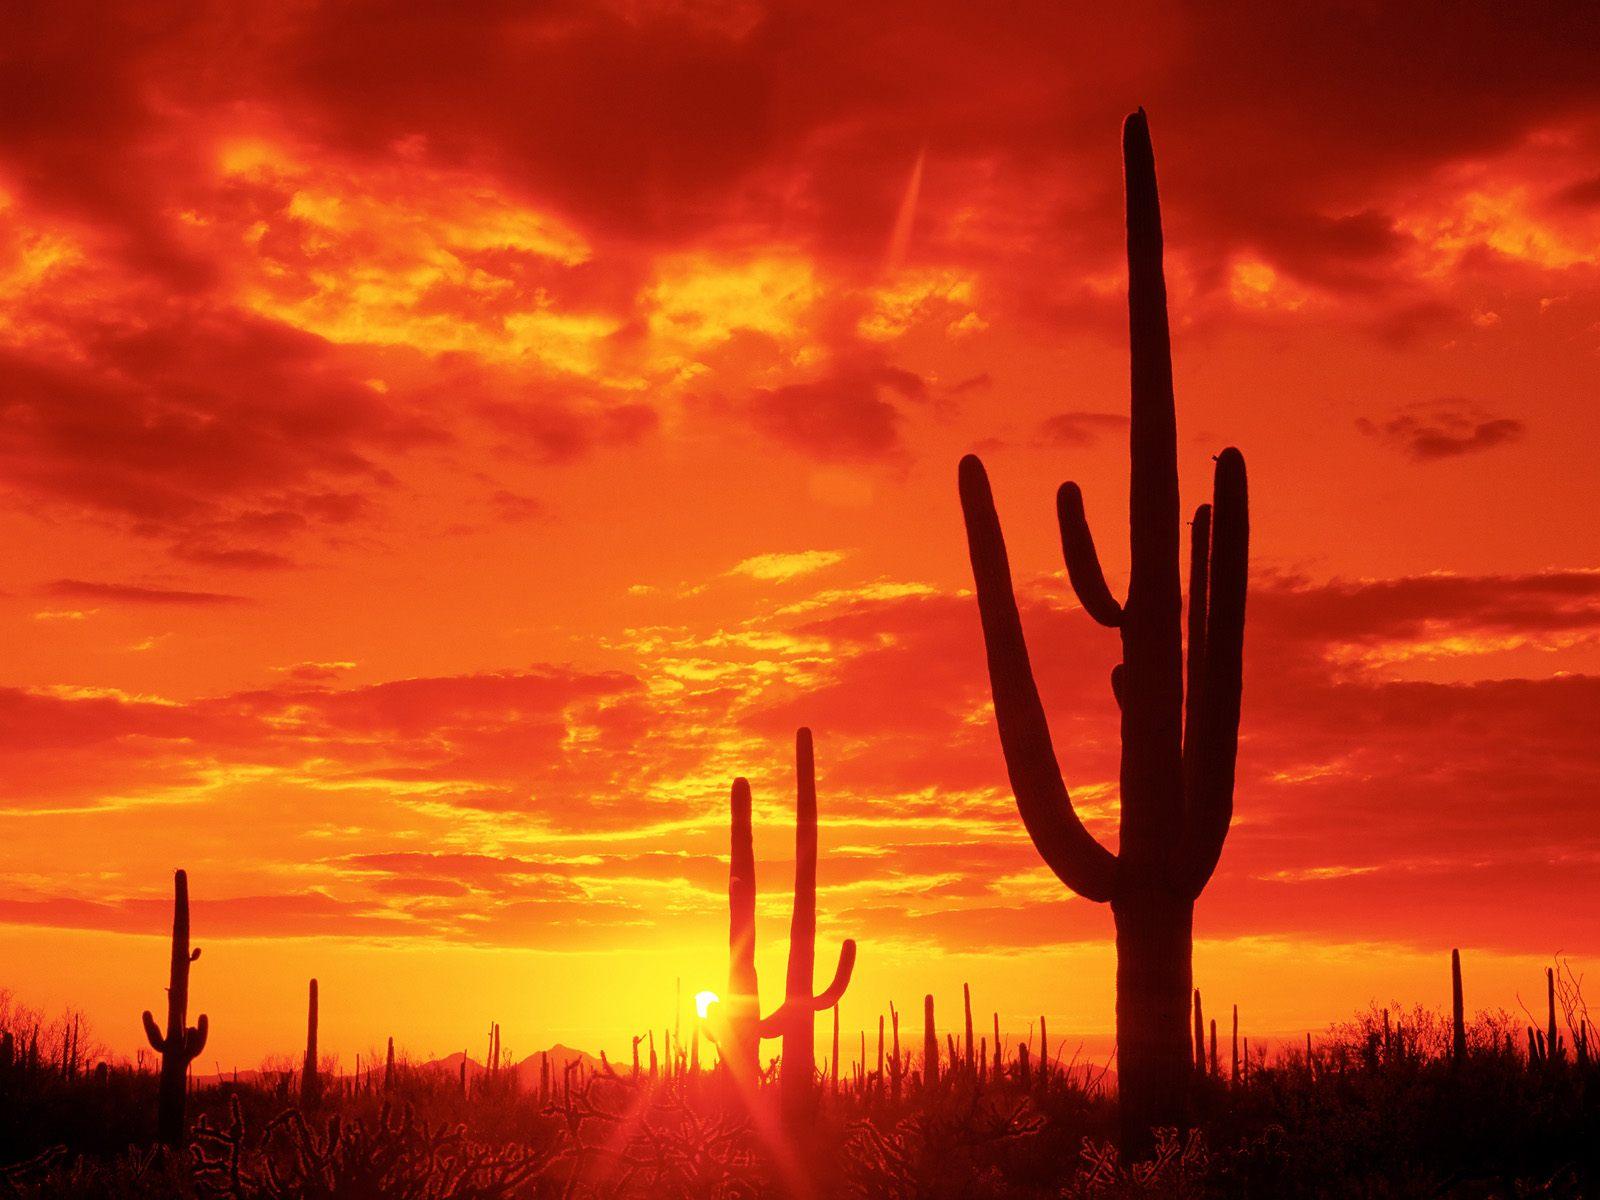 Sunset Saguaro National Park Arizona Wallpaper   HQ Wallpapers 1600x1200